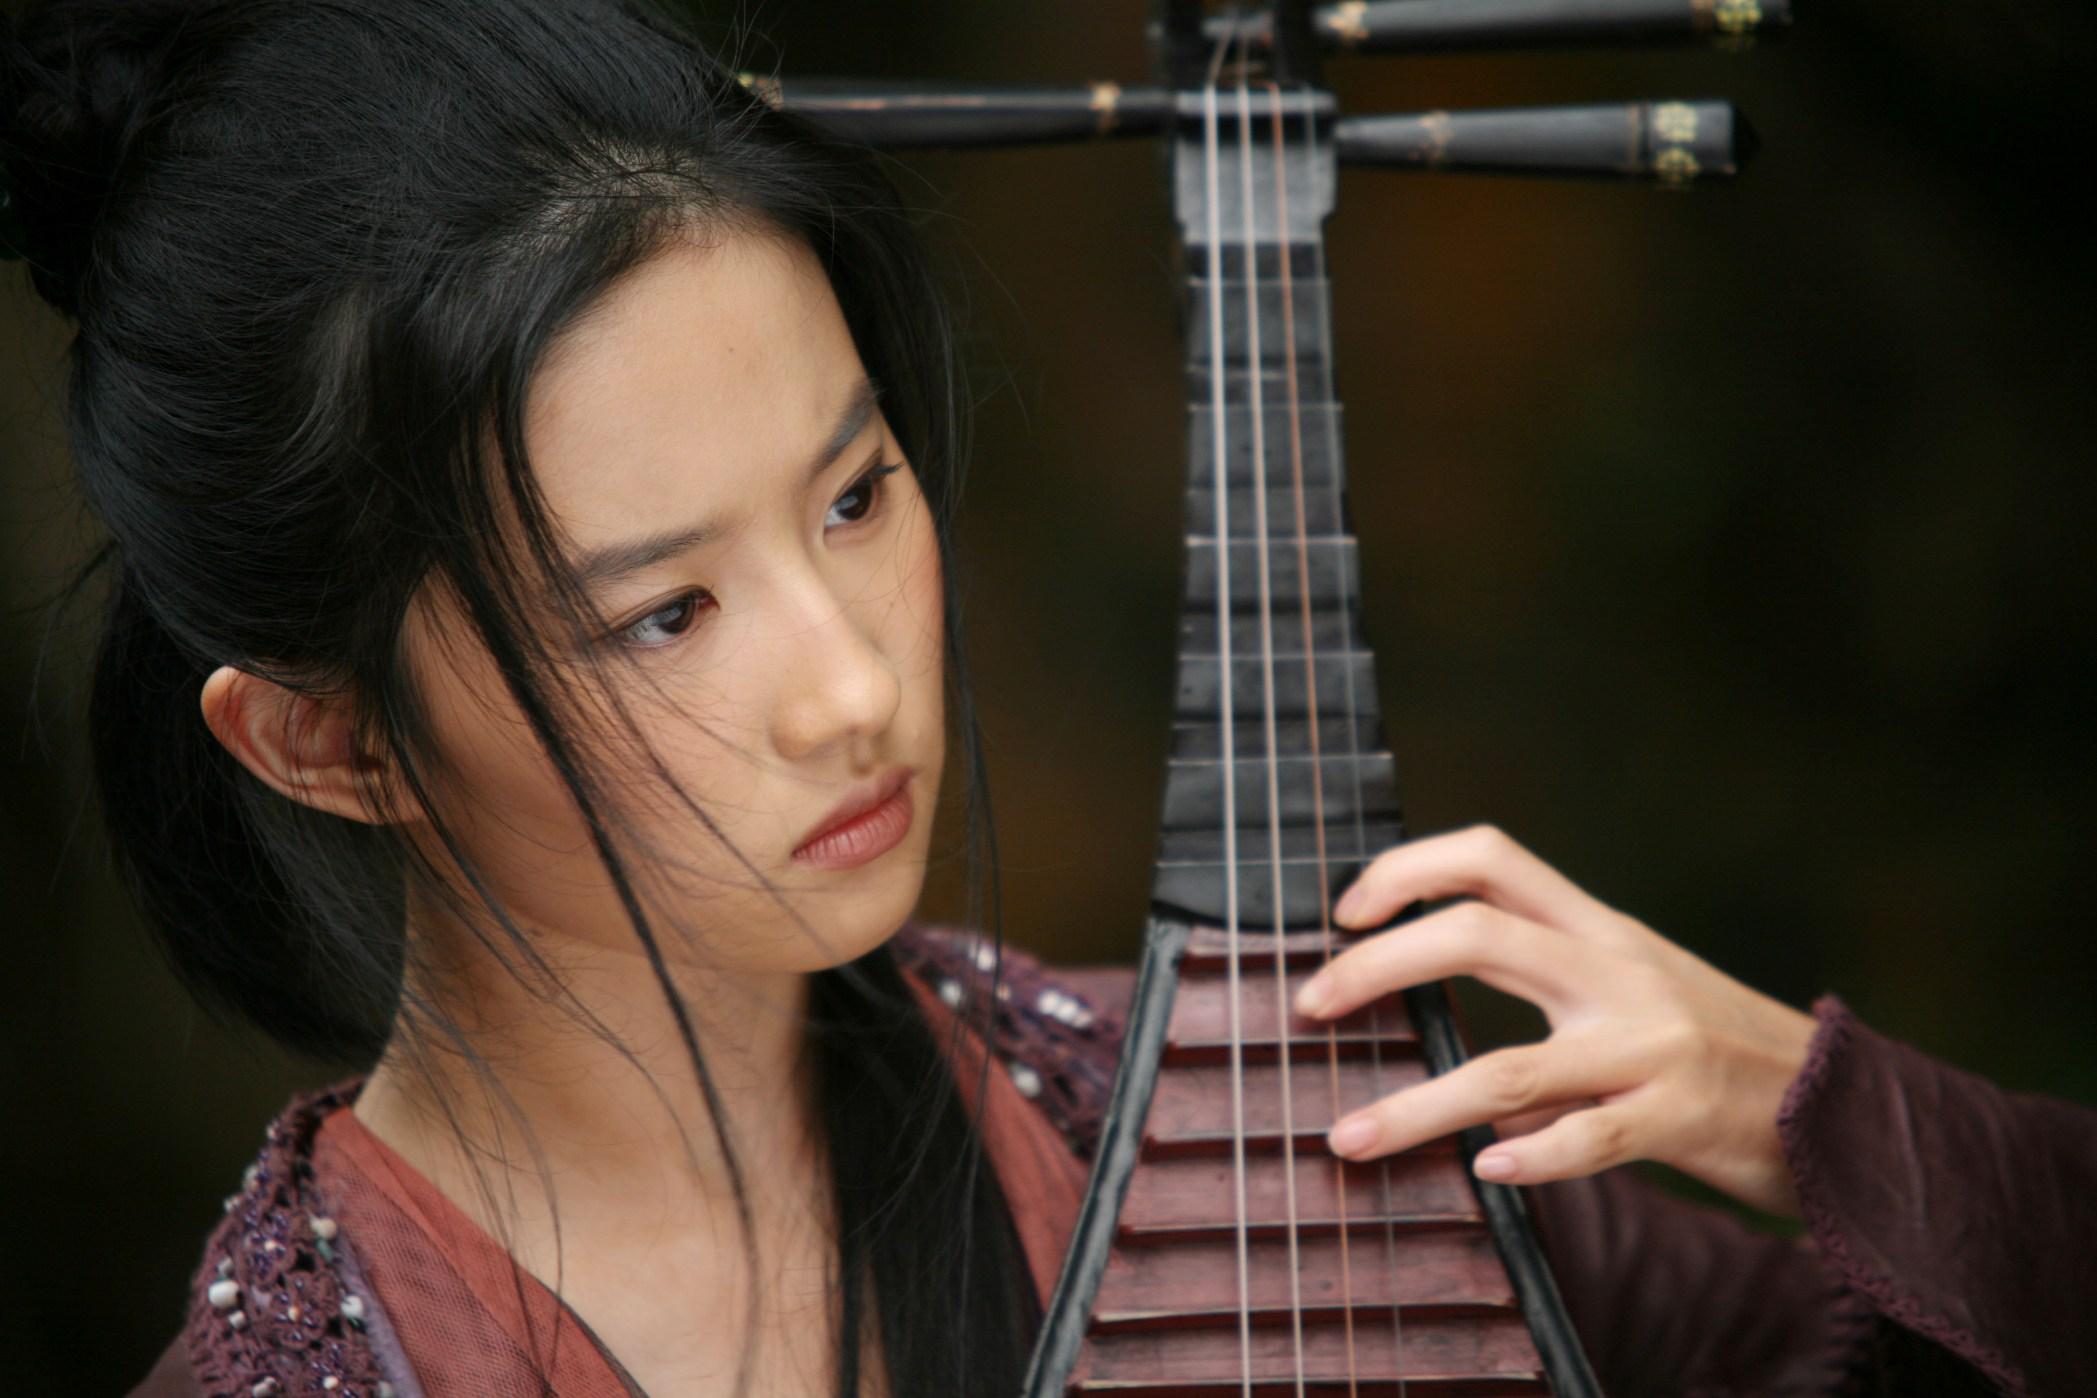 Amazing Liu Yifei Pictures & Backgrounds